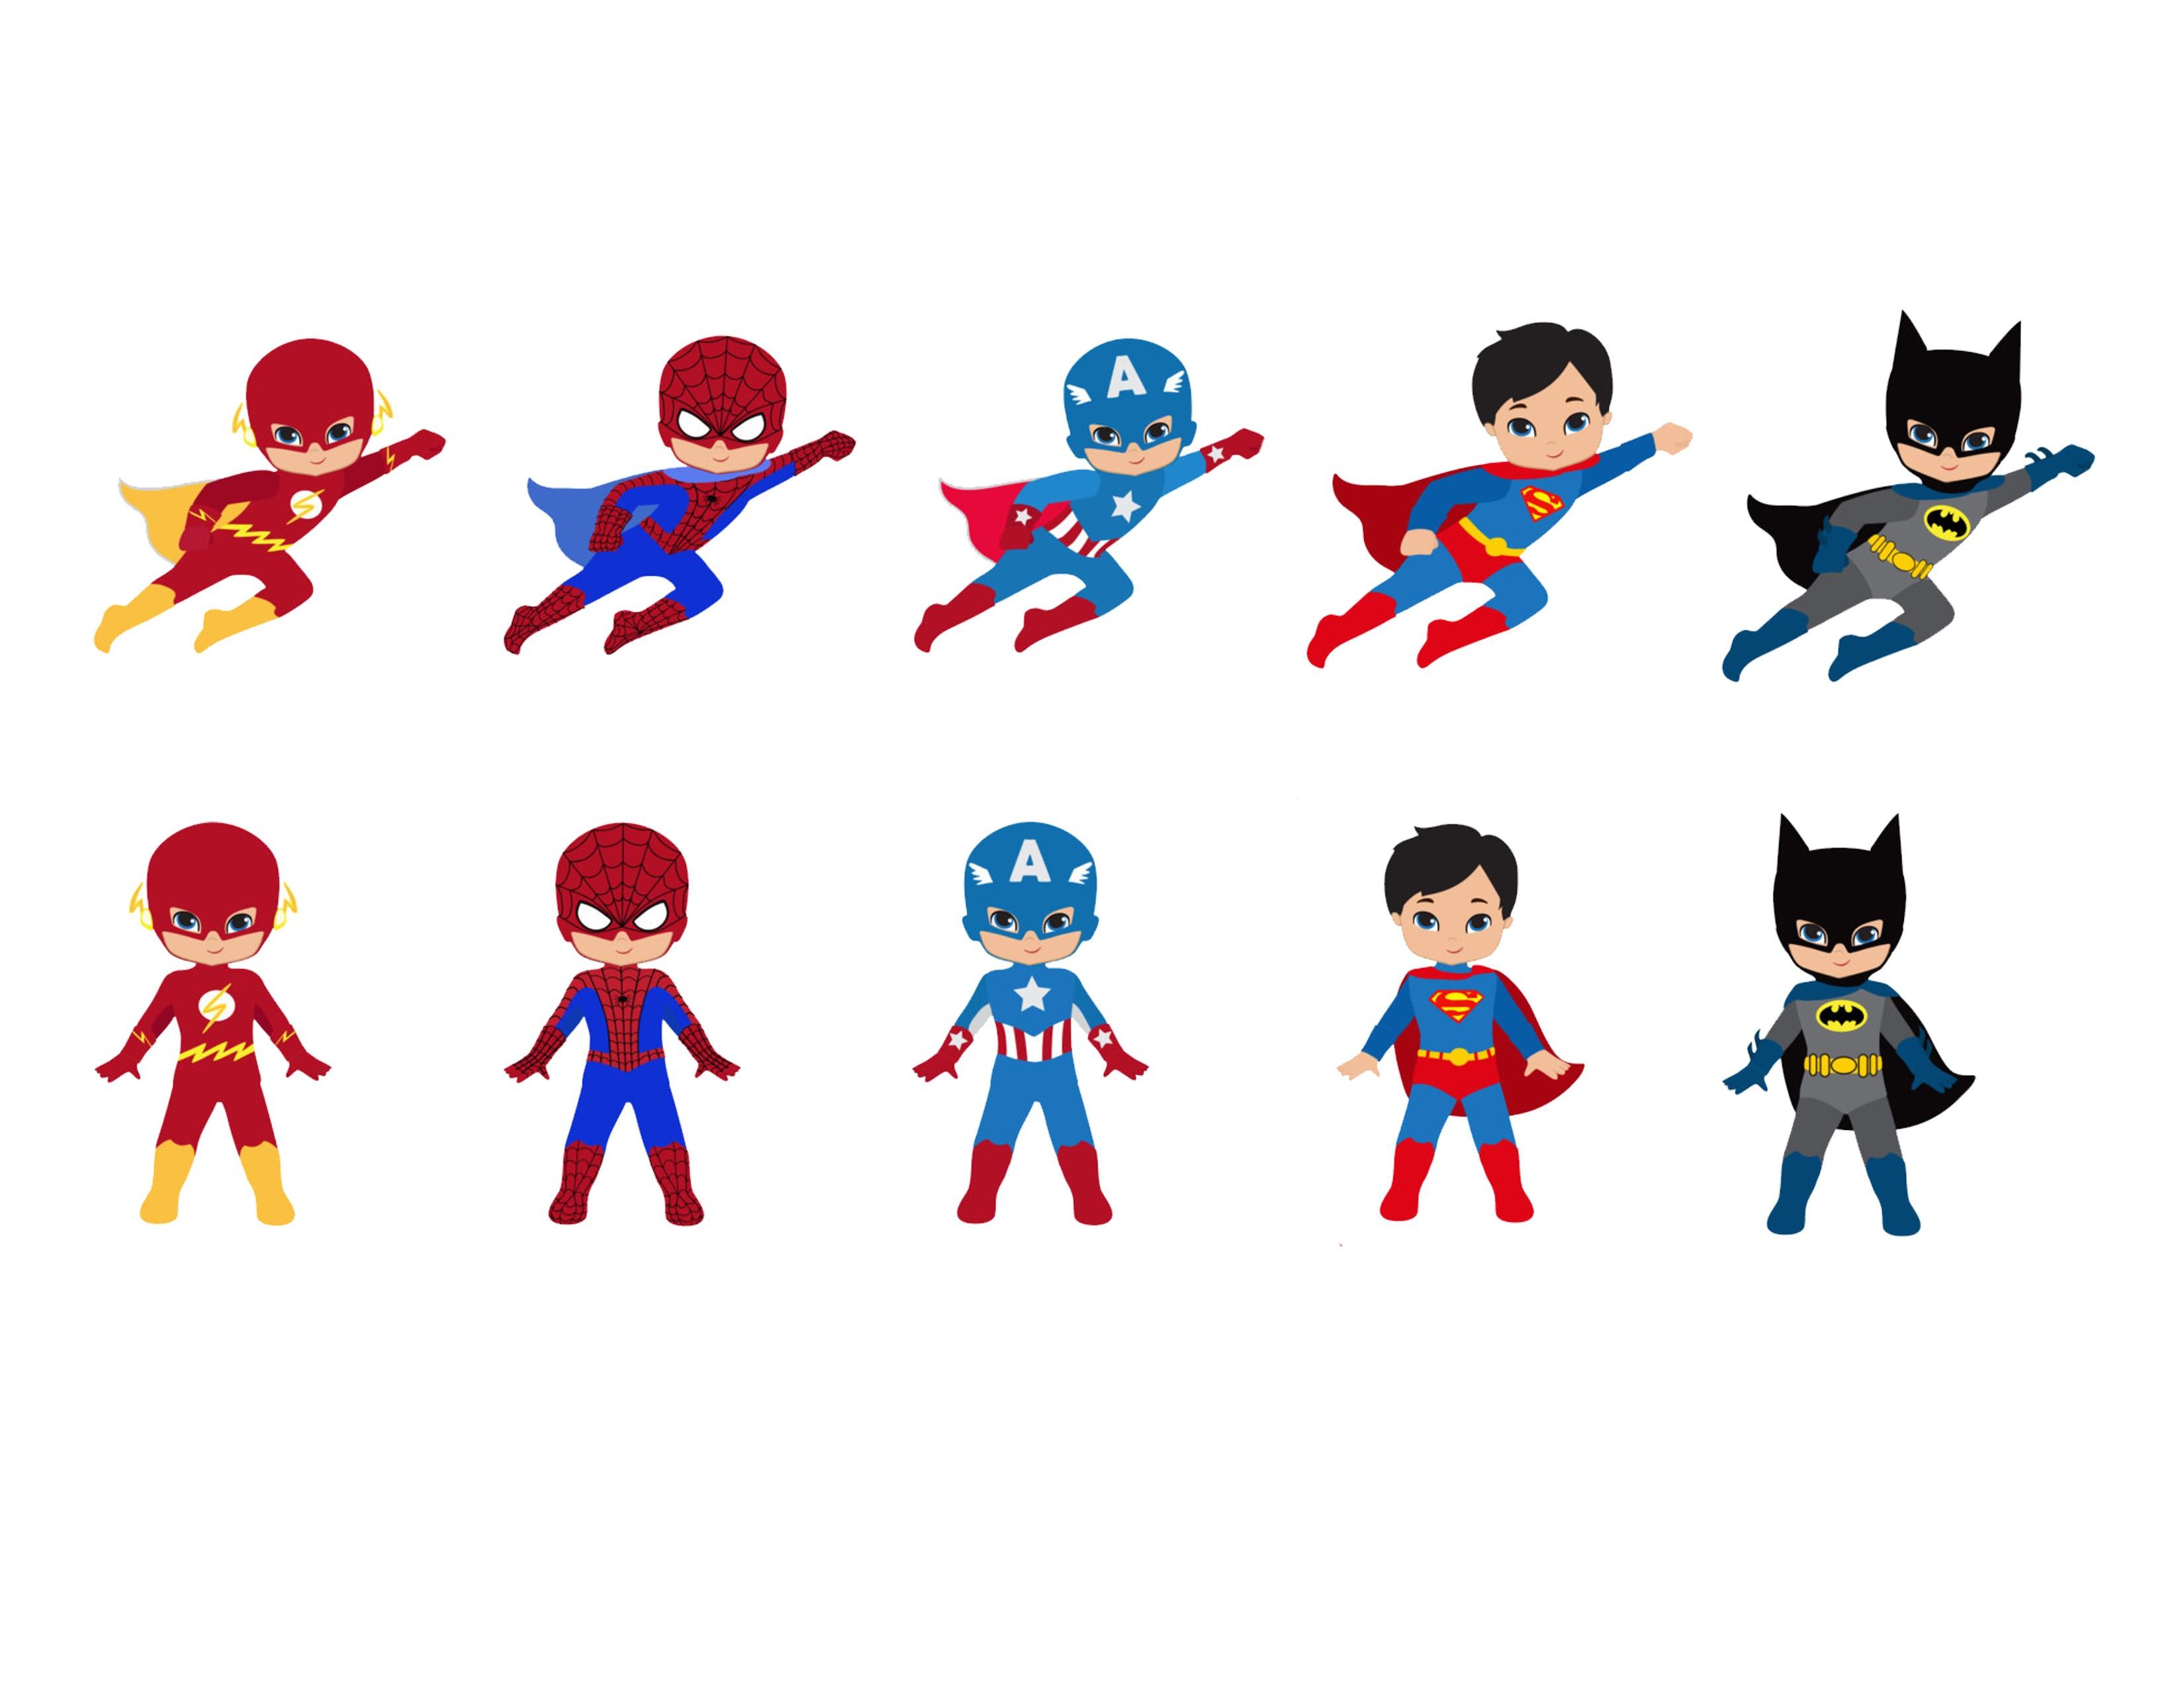 3300x2550 Images For Gt Cute Cartoon Superheroes Super Heros Kid Cartoons